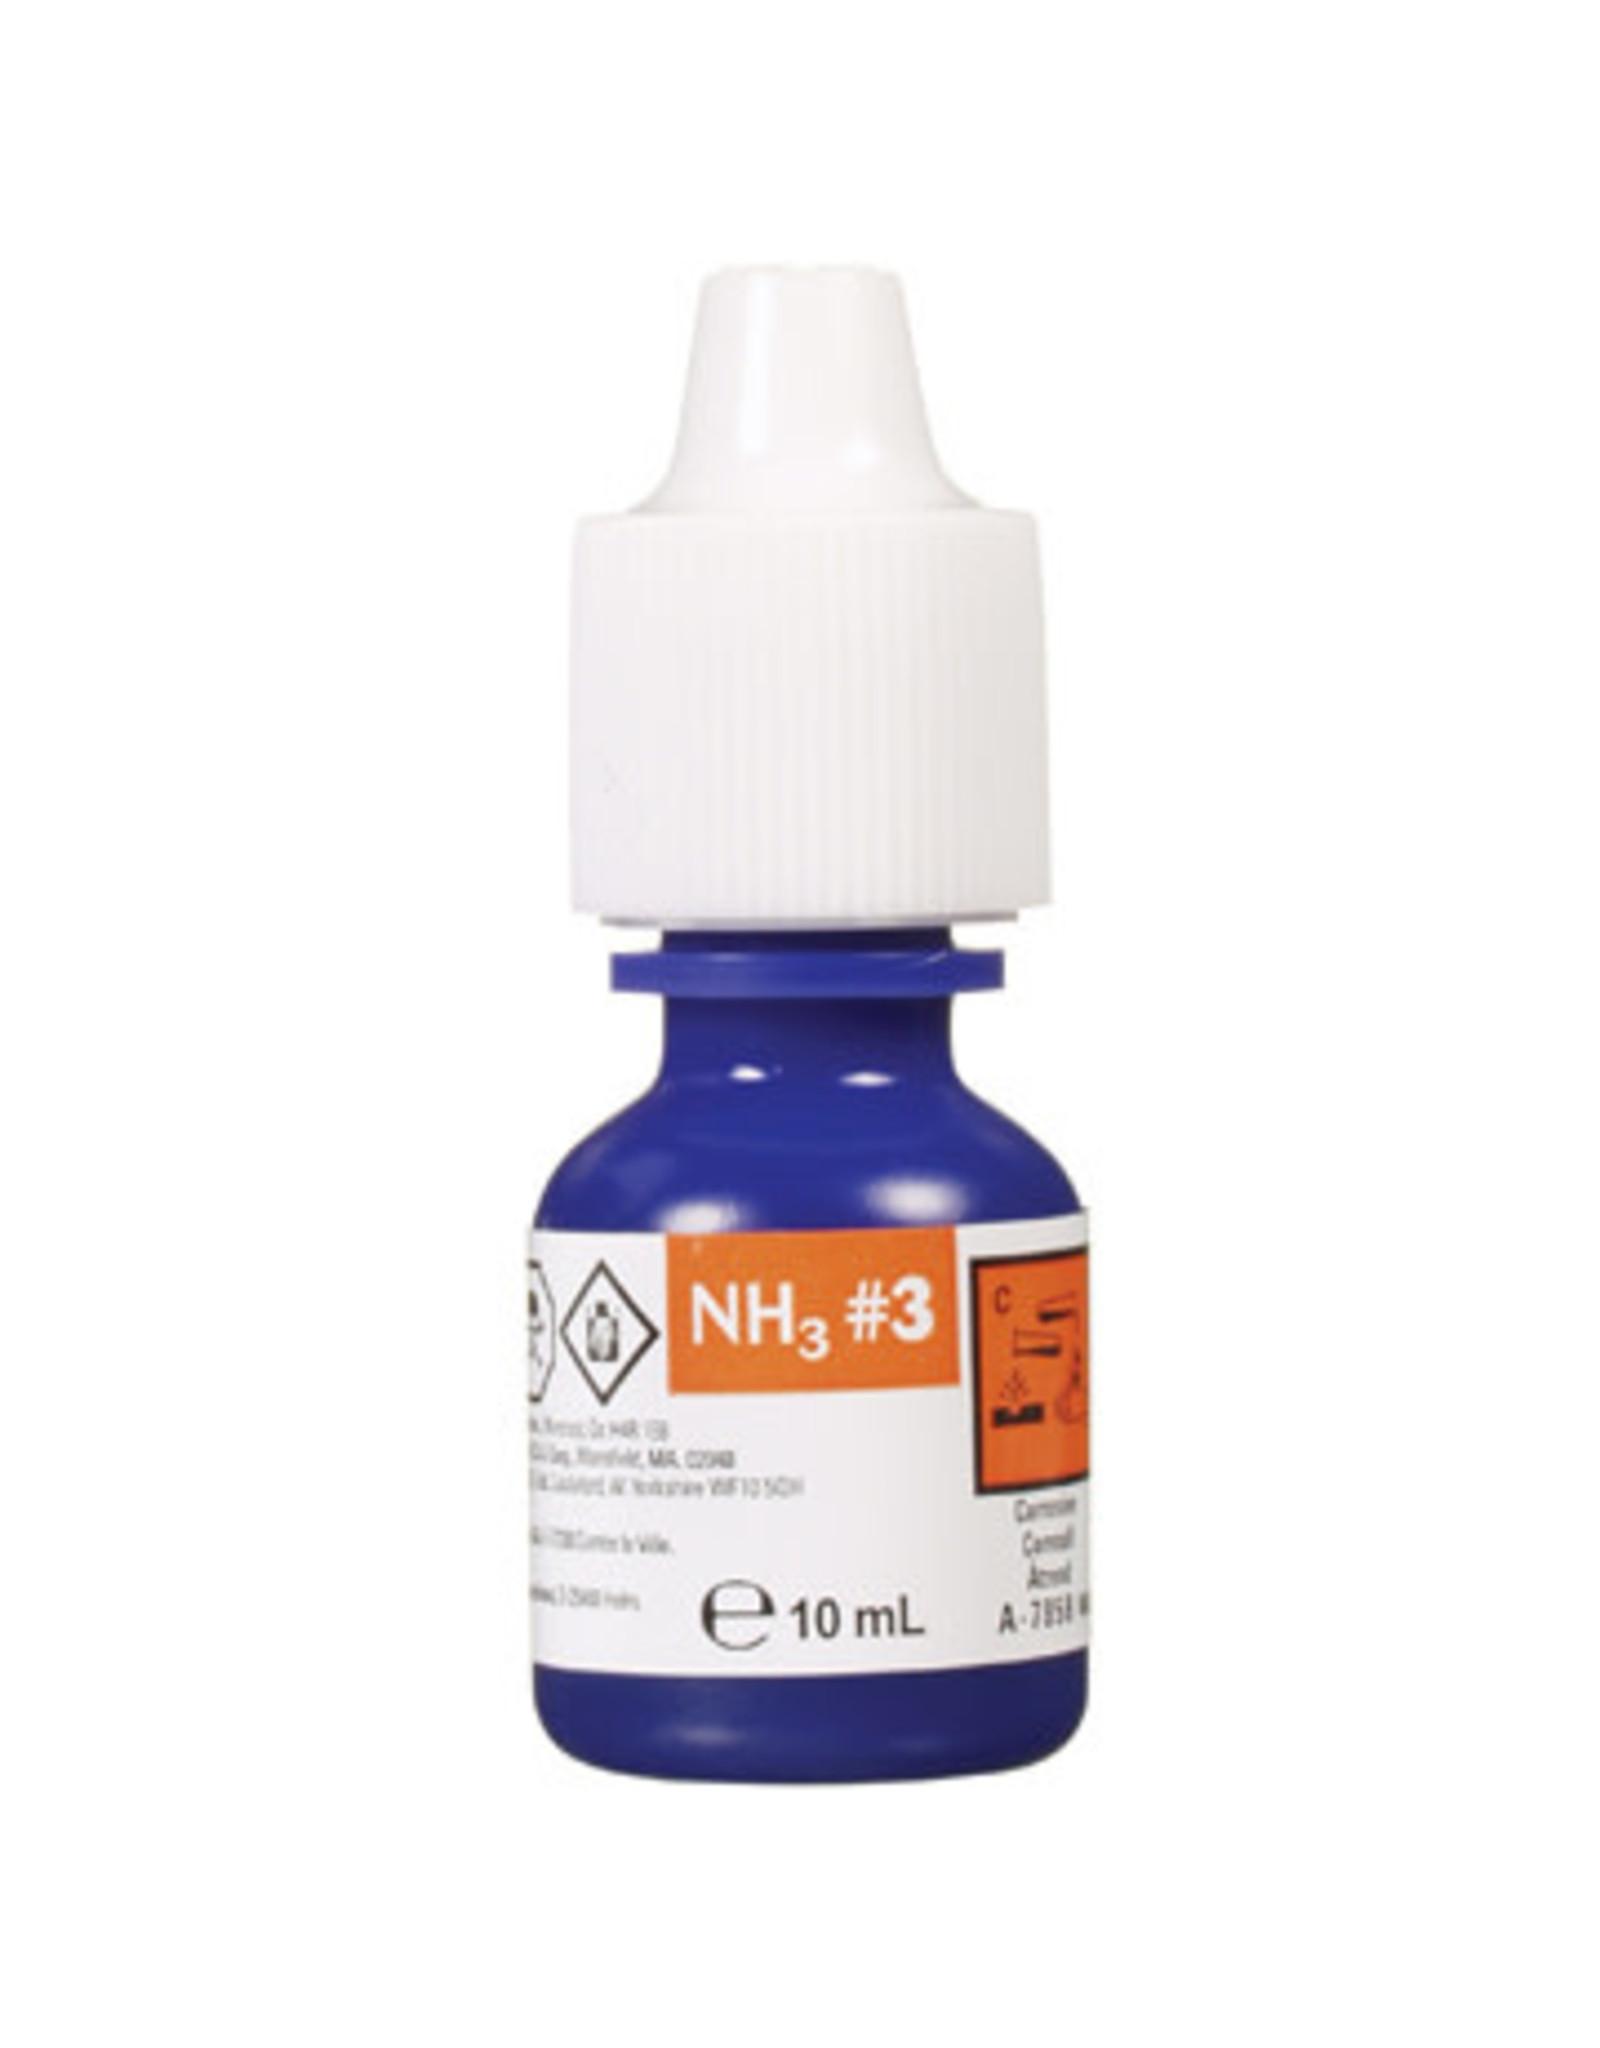 Nutrafin Nutrafin Ammonia fresh and saltwater reagent #3 refill, 10 mL (0.3 fl oz)